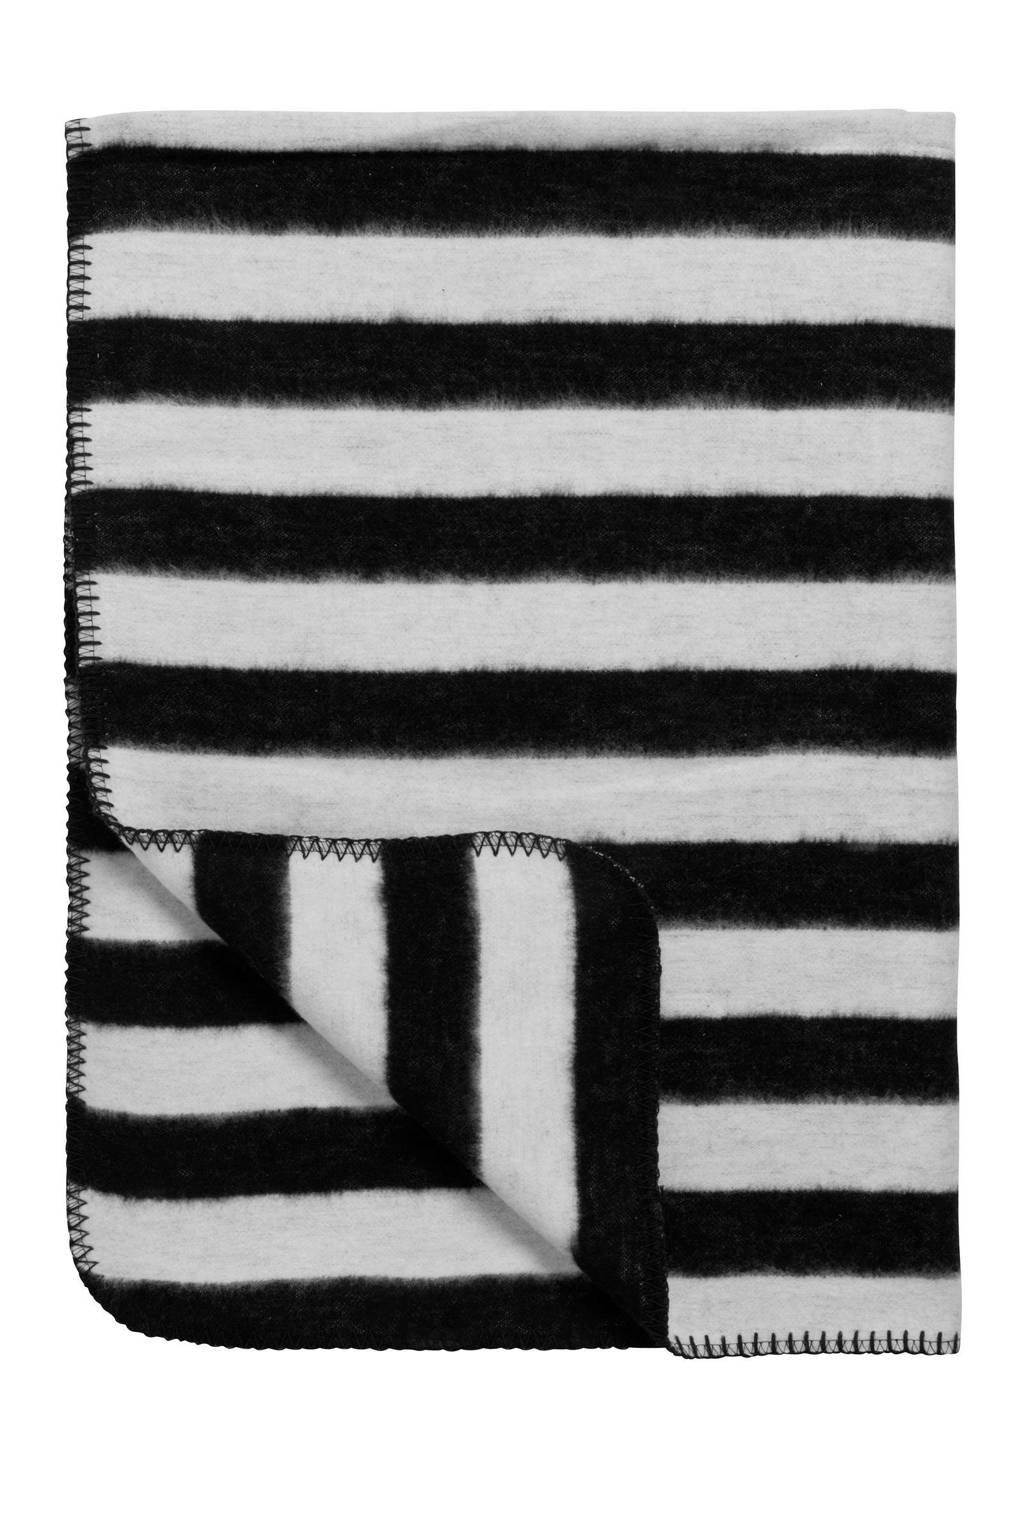 Meyco Stripe biologische wiegdeken 75x100 cm zwart/wit